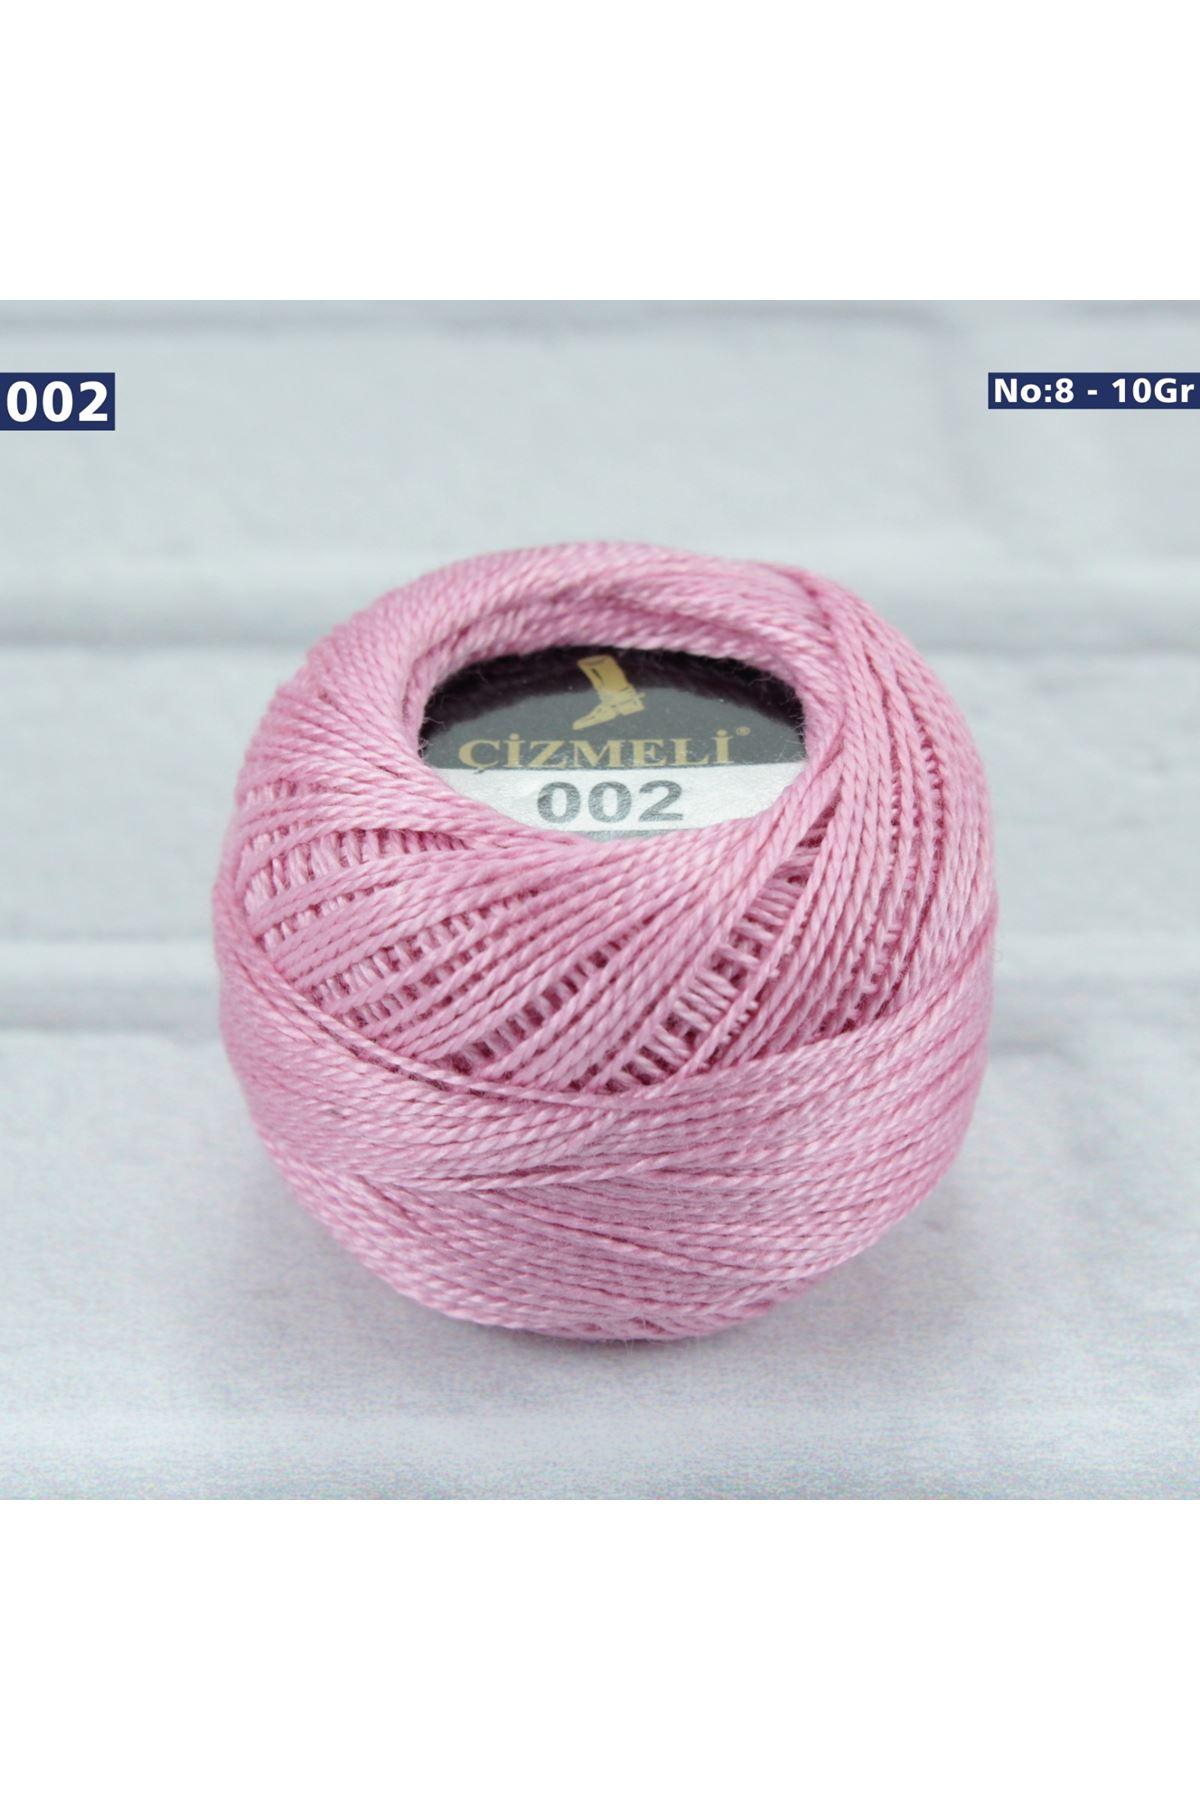 Çizmeli Cotton Perle Nakış İpliği No: 002